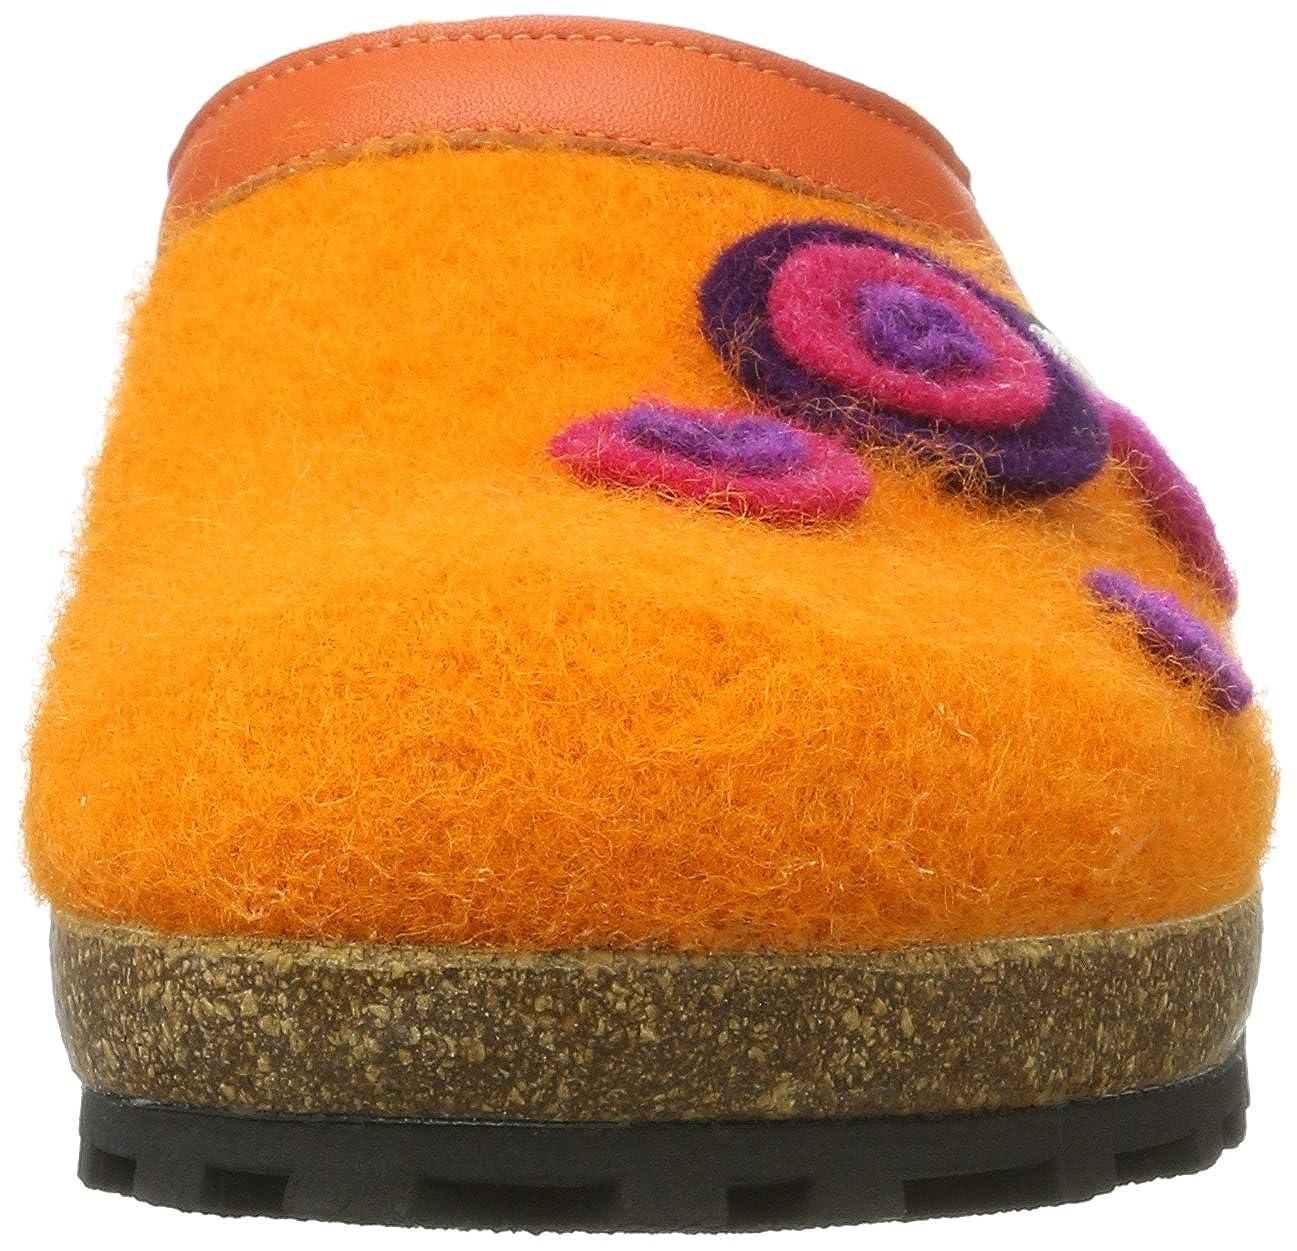 Giesswein Unisex-Erwachsene Calau Pantoffeln, Orange (Mandarine), 42 EU